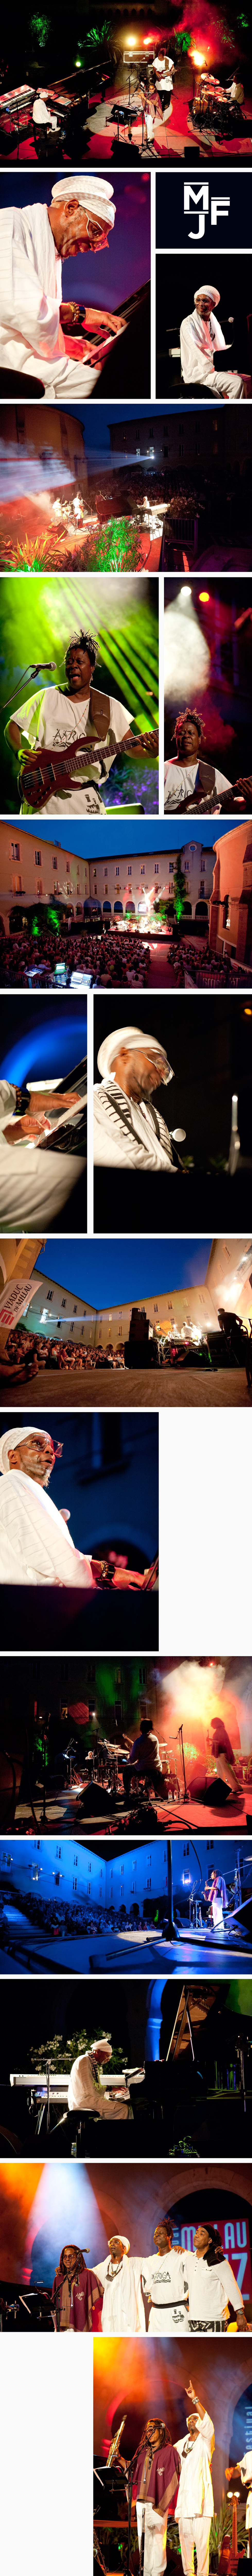 Omar Sosa Millau en Jazz